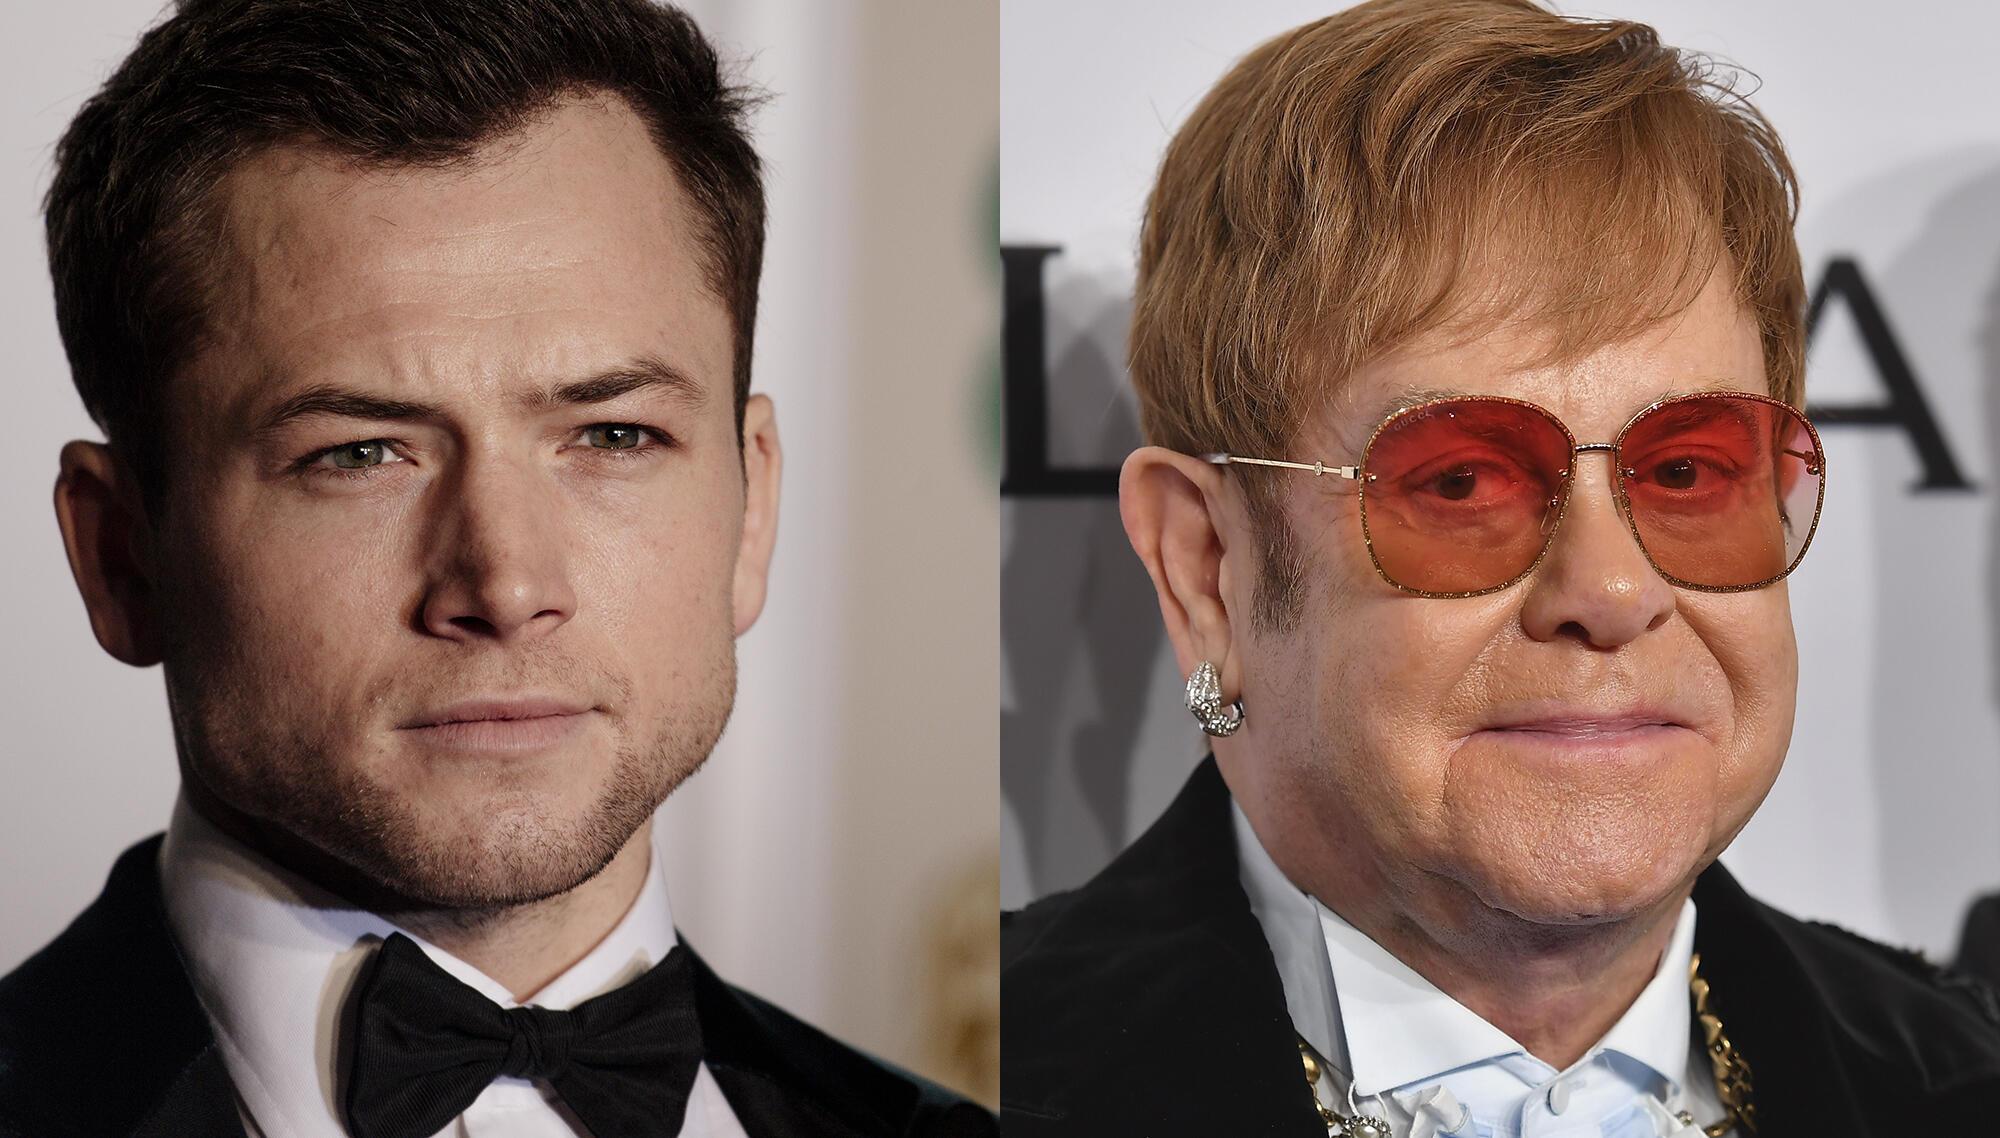 See Taron Egerton Become Elton John For 'Rocketman' Biopic